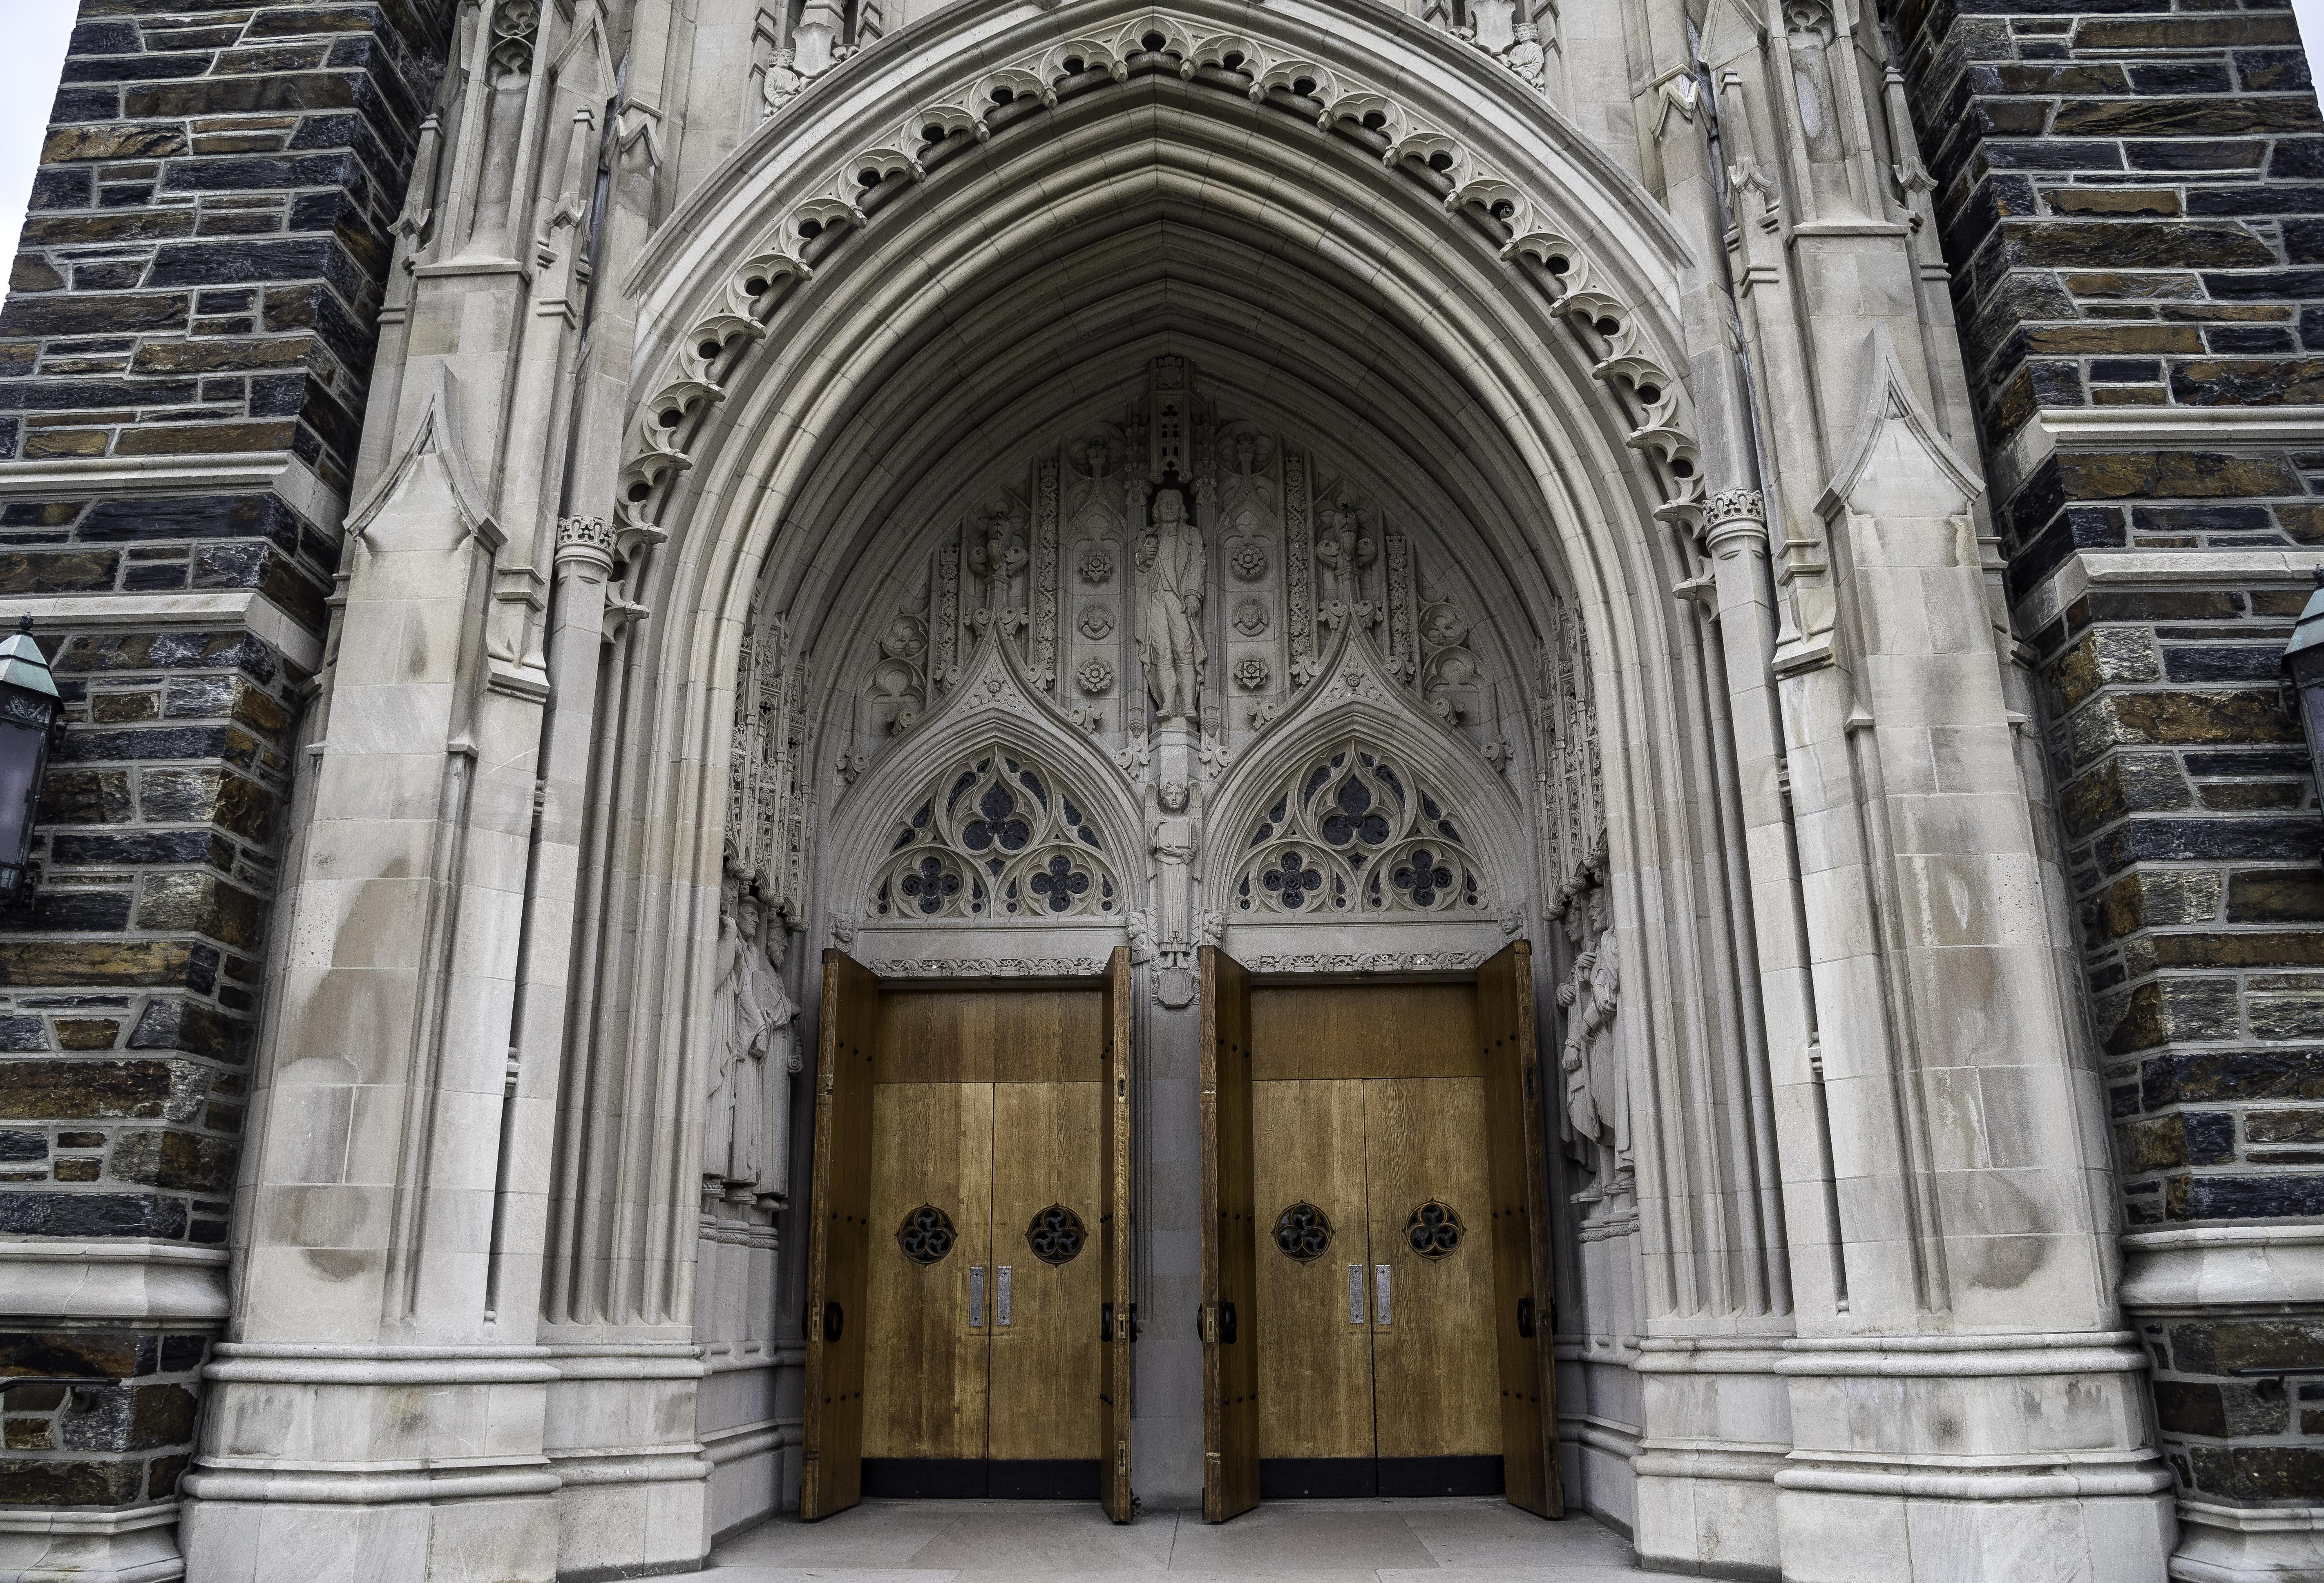 Free ... & Cathedral Door Archway at Duke Chapel Durham North Carolina image ...